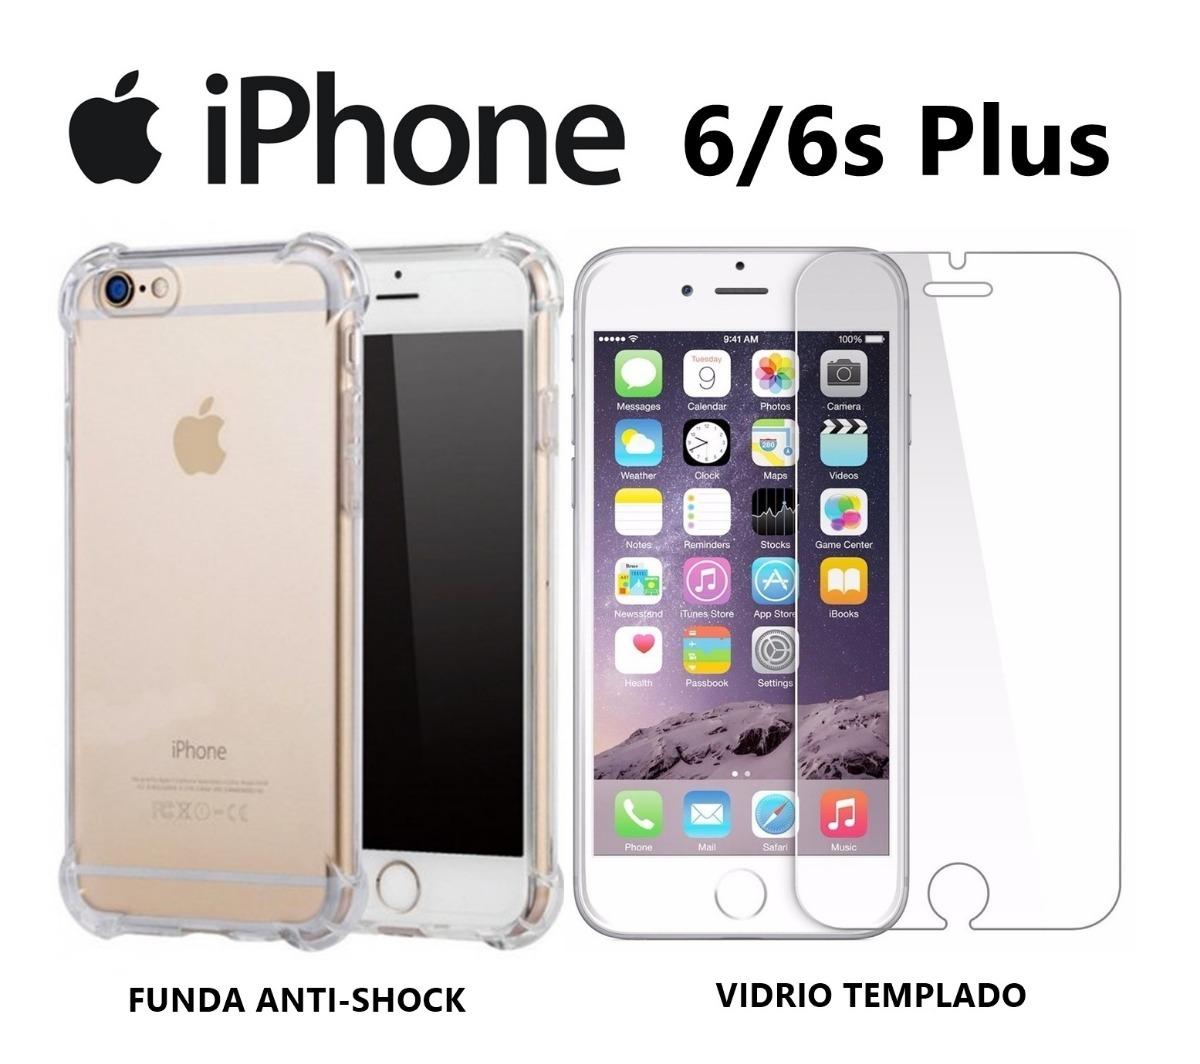 10761ae79ee funda antishock + vidrio templado iphone 6 6s plus rosario. Cargando zoom.